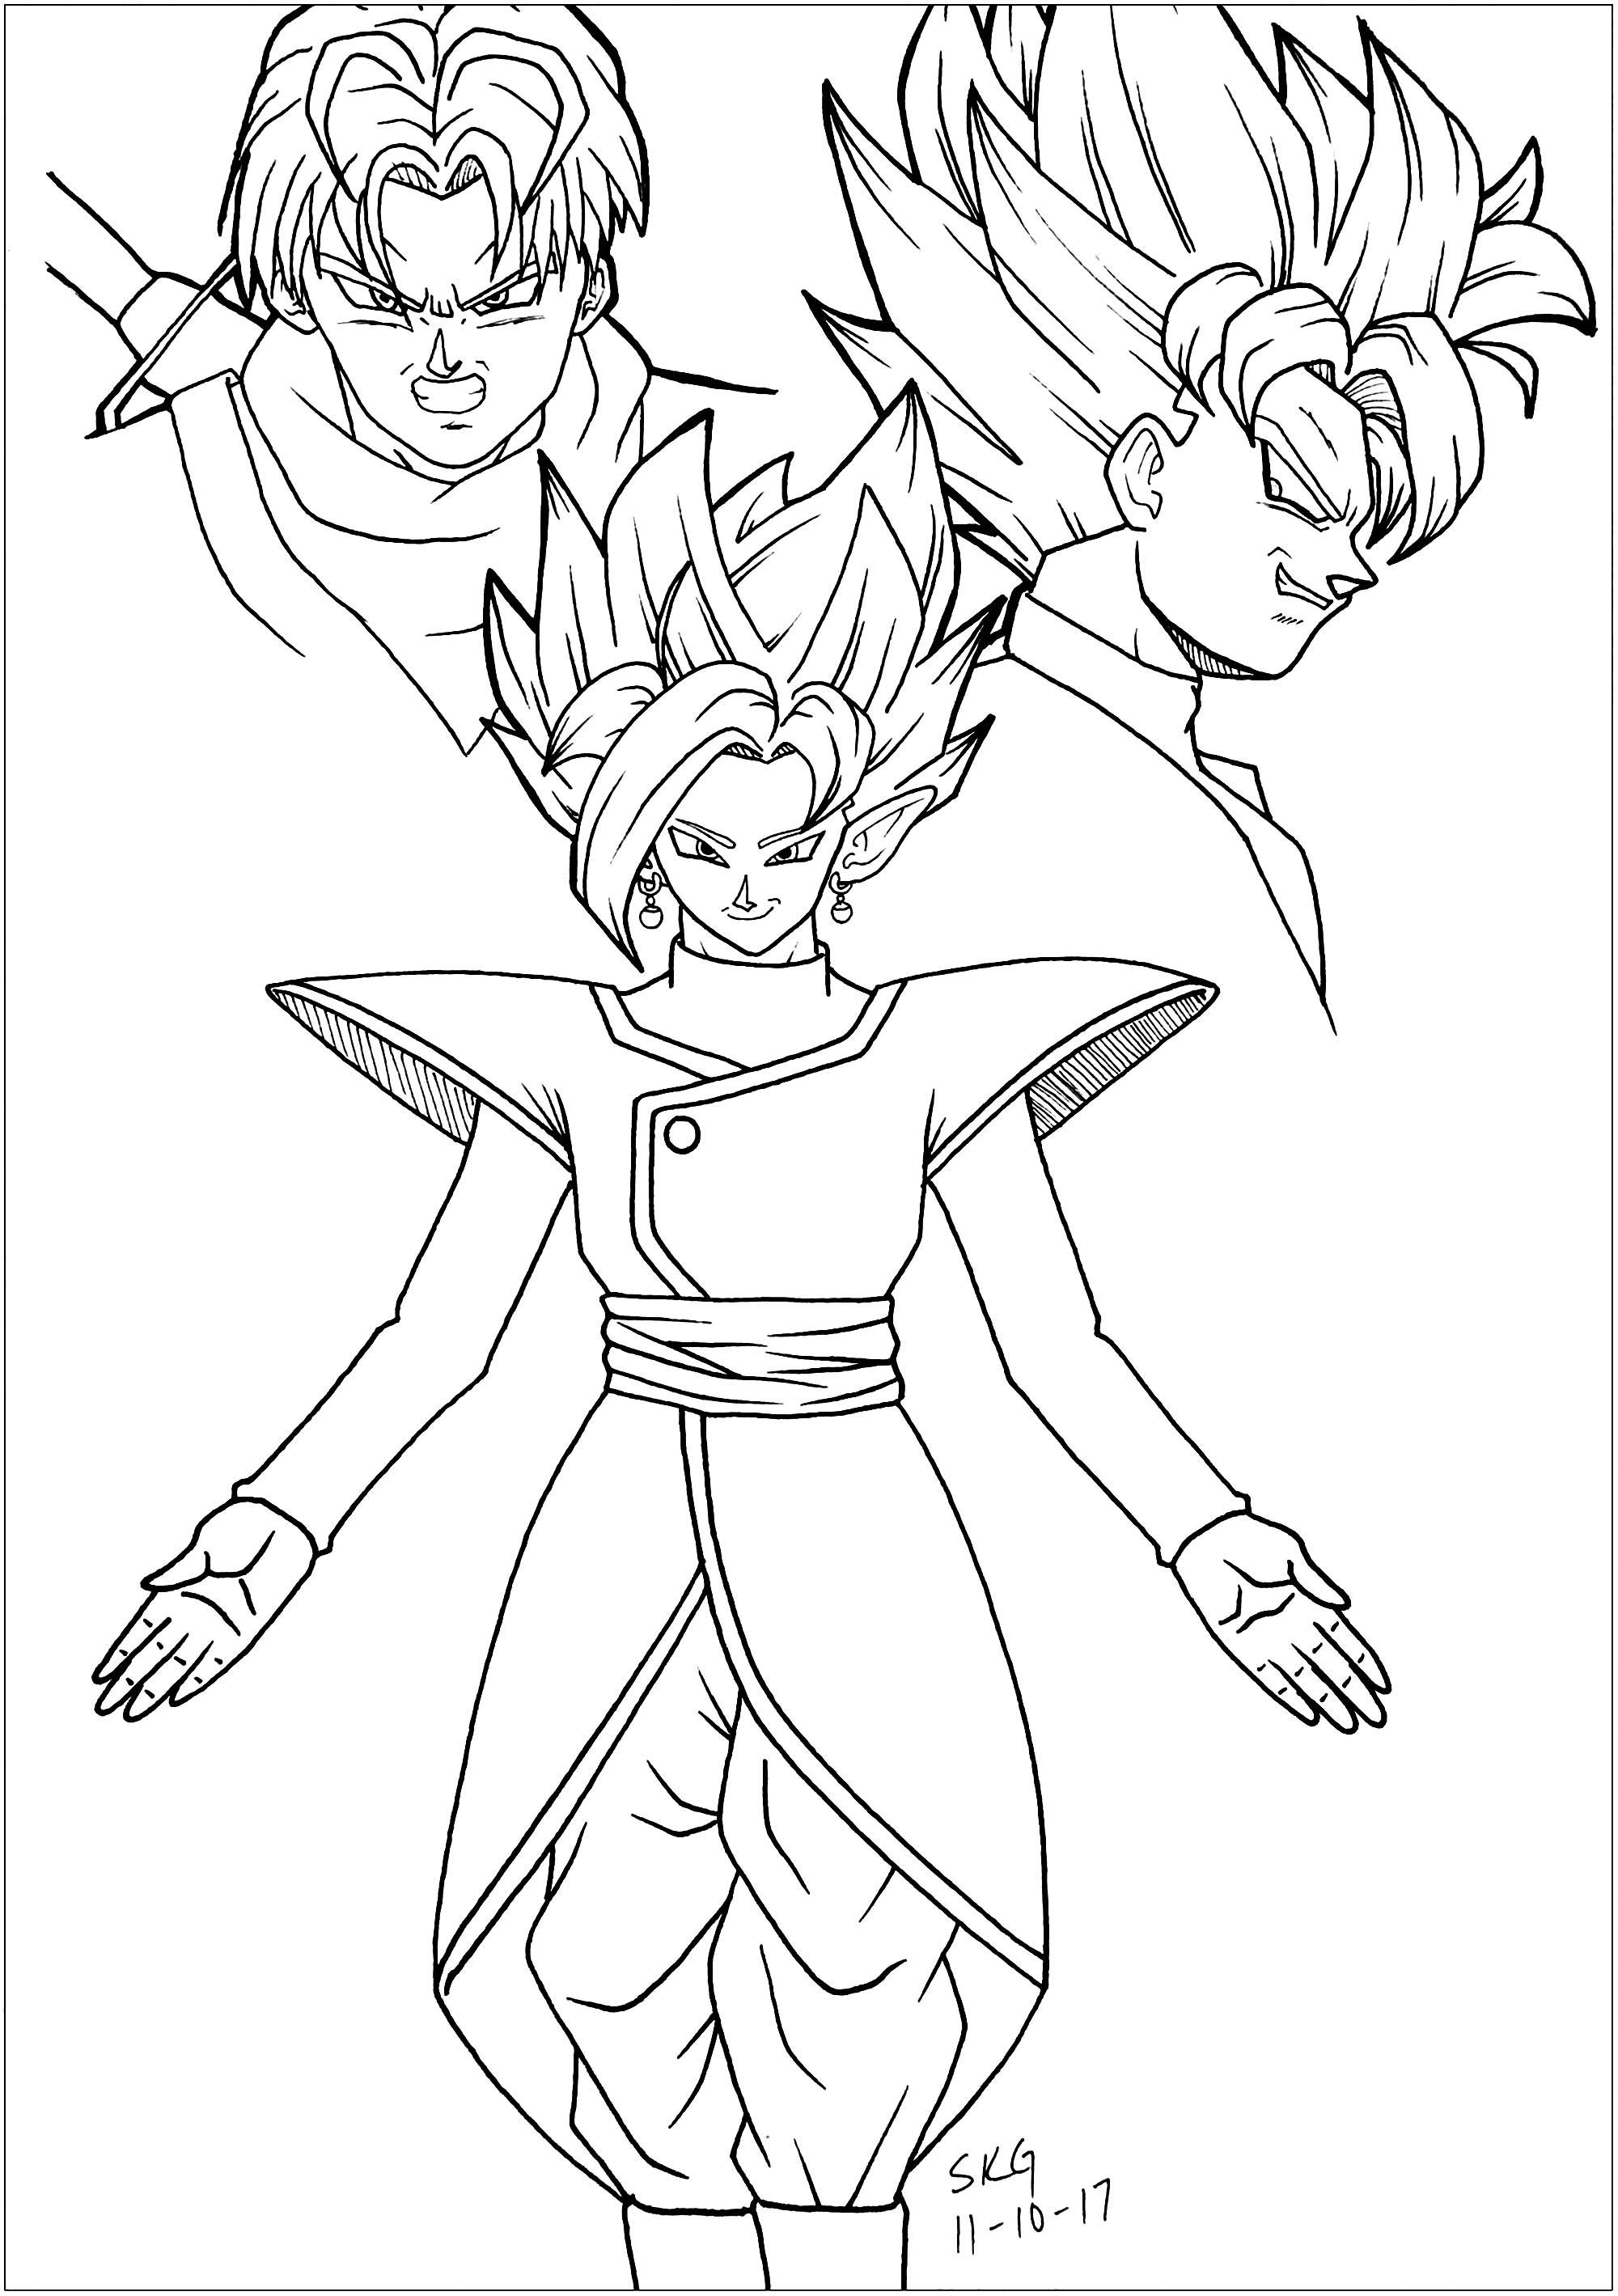 Black Goku Trunks And Zamasu